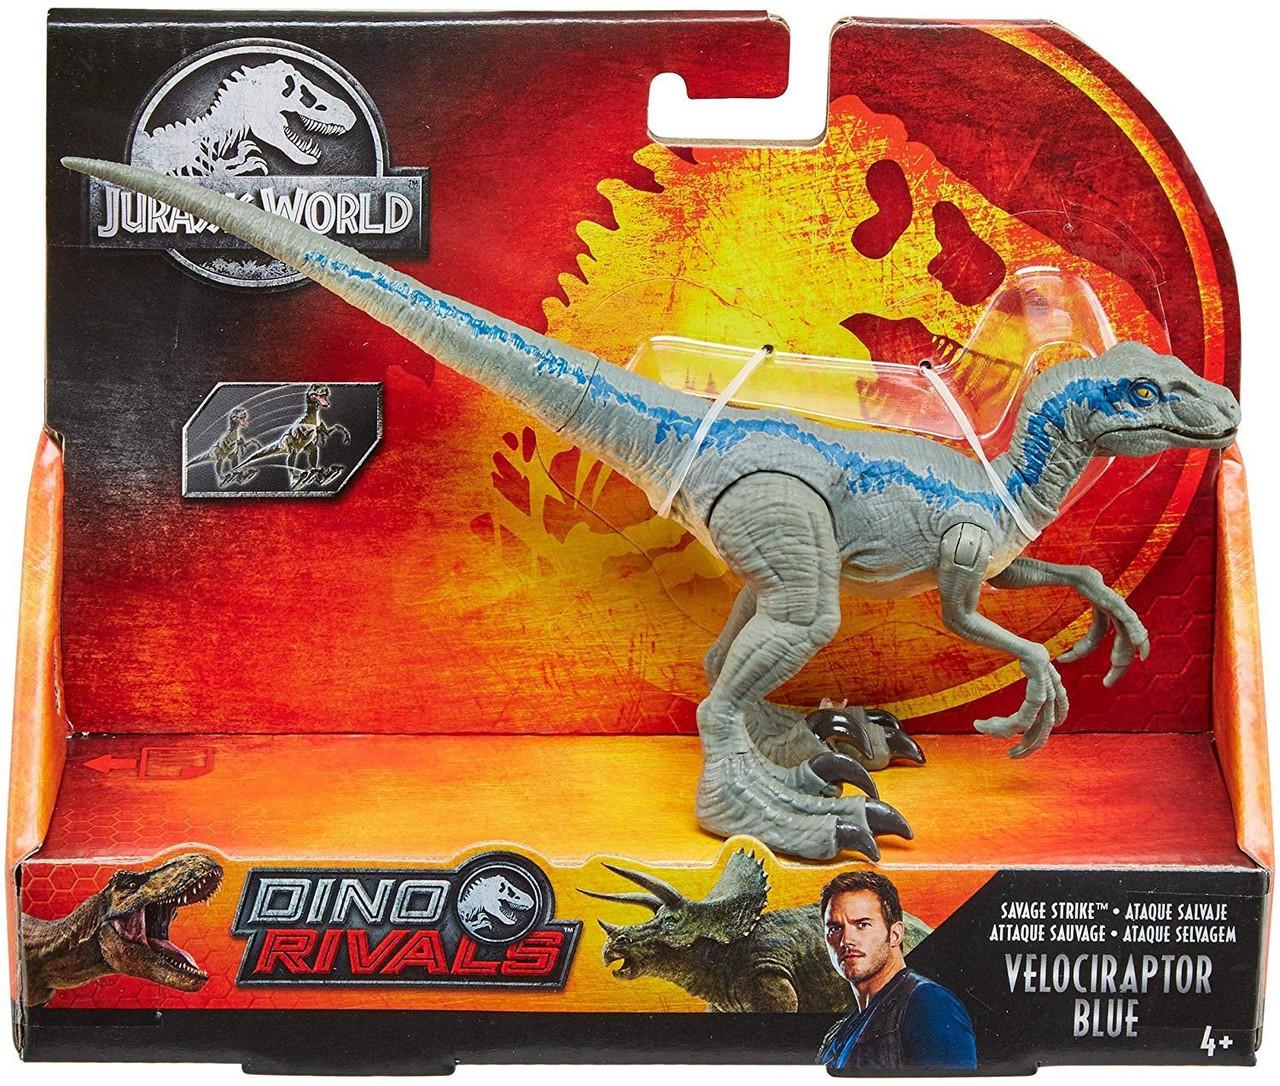 Jurassic World Velociraptor Blue Dinosaur Toy Attack Pack Figure Fallen Kingdom